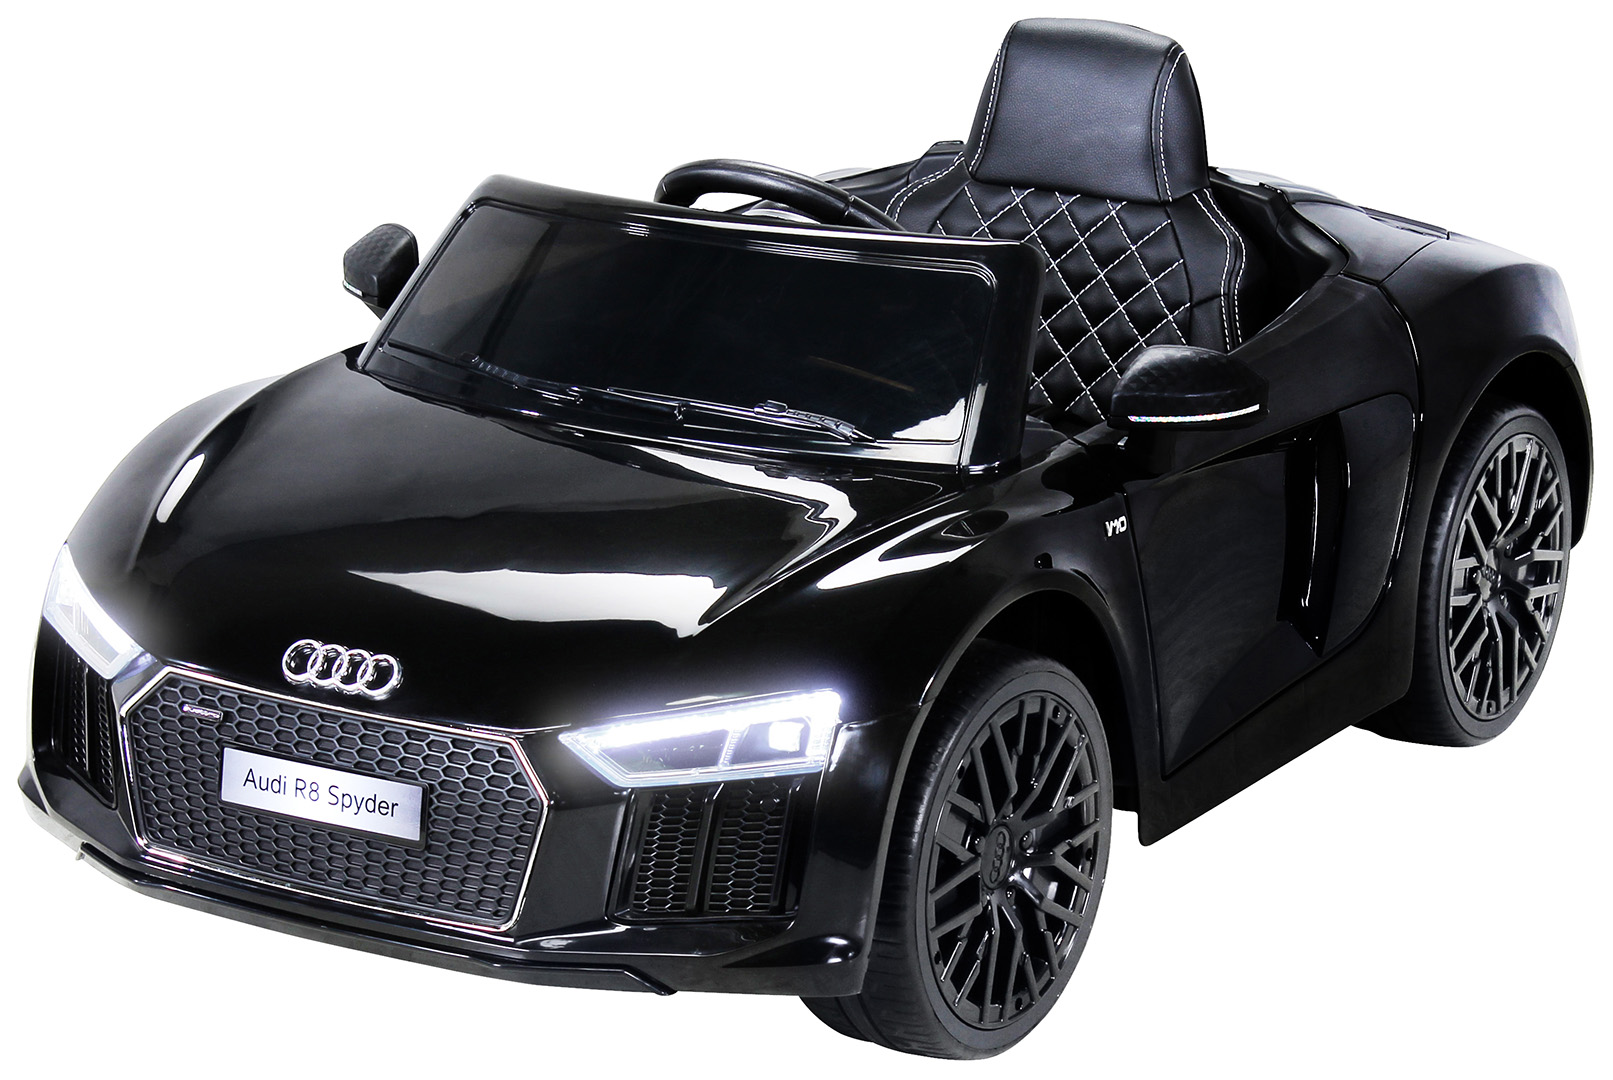 quadfactory bottrop kinder elektroauto audi r8 spyder modell 2018 lizenziert. Black Bedroom Furniture Sets. Home Design Ideas